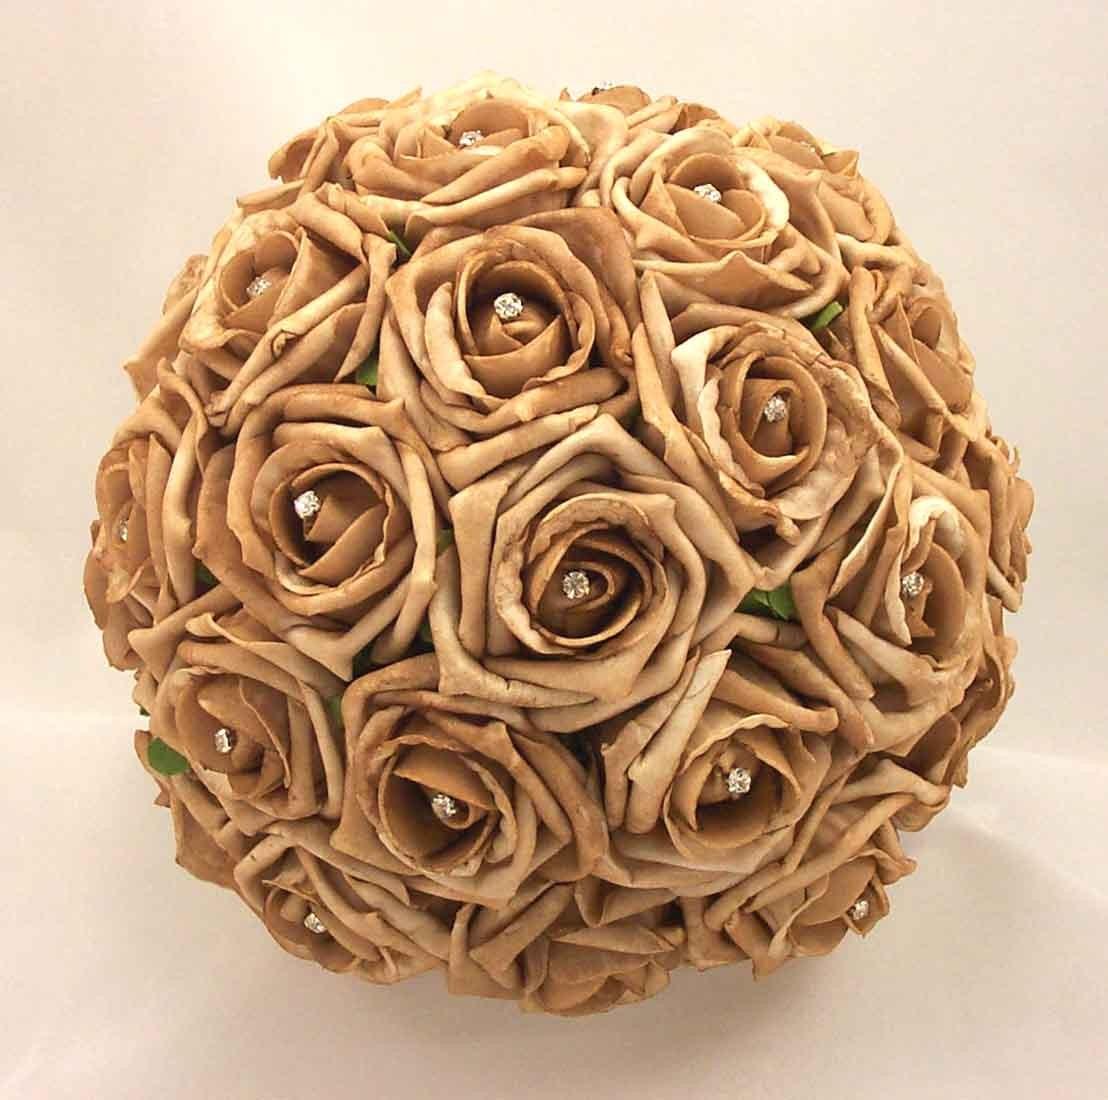 Mocha Rose Diamante Bridal Bouquet